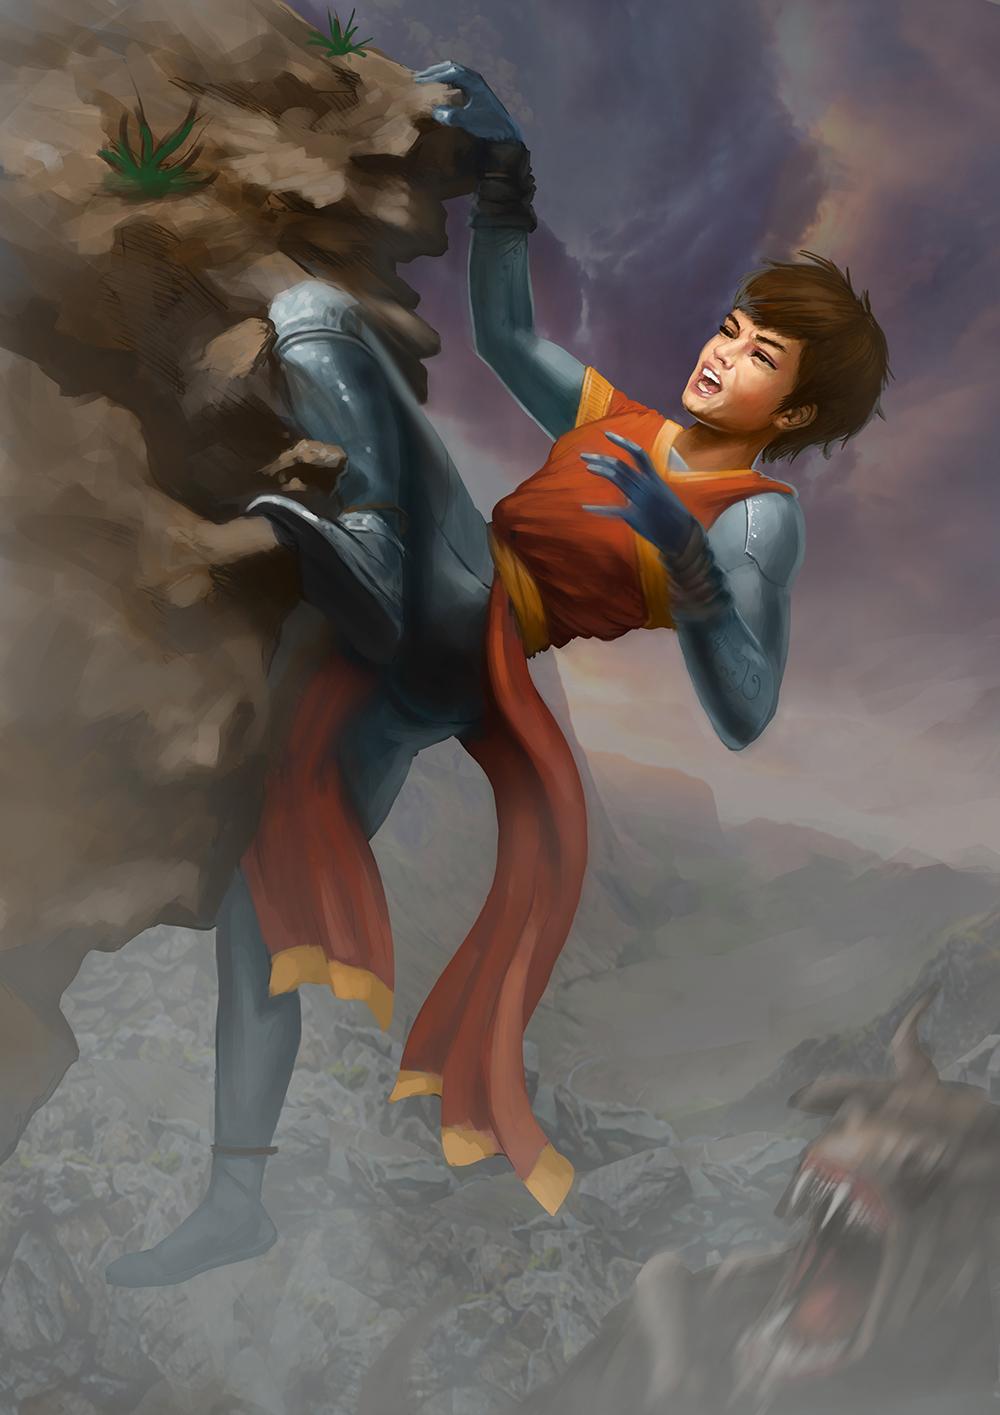 Sila climbing character vali lancea